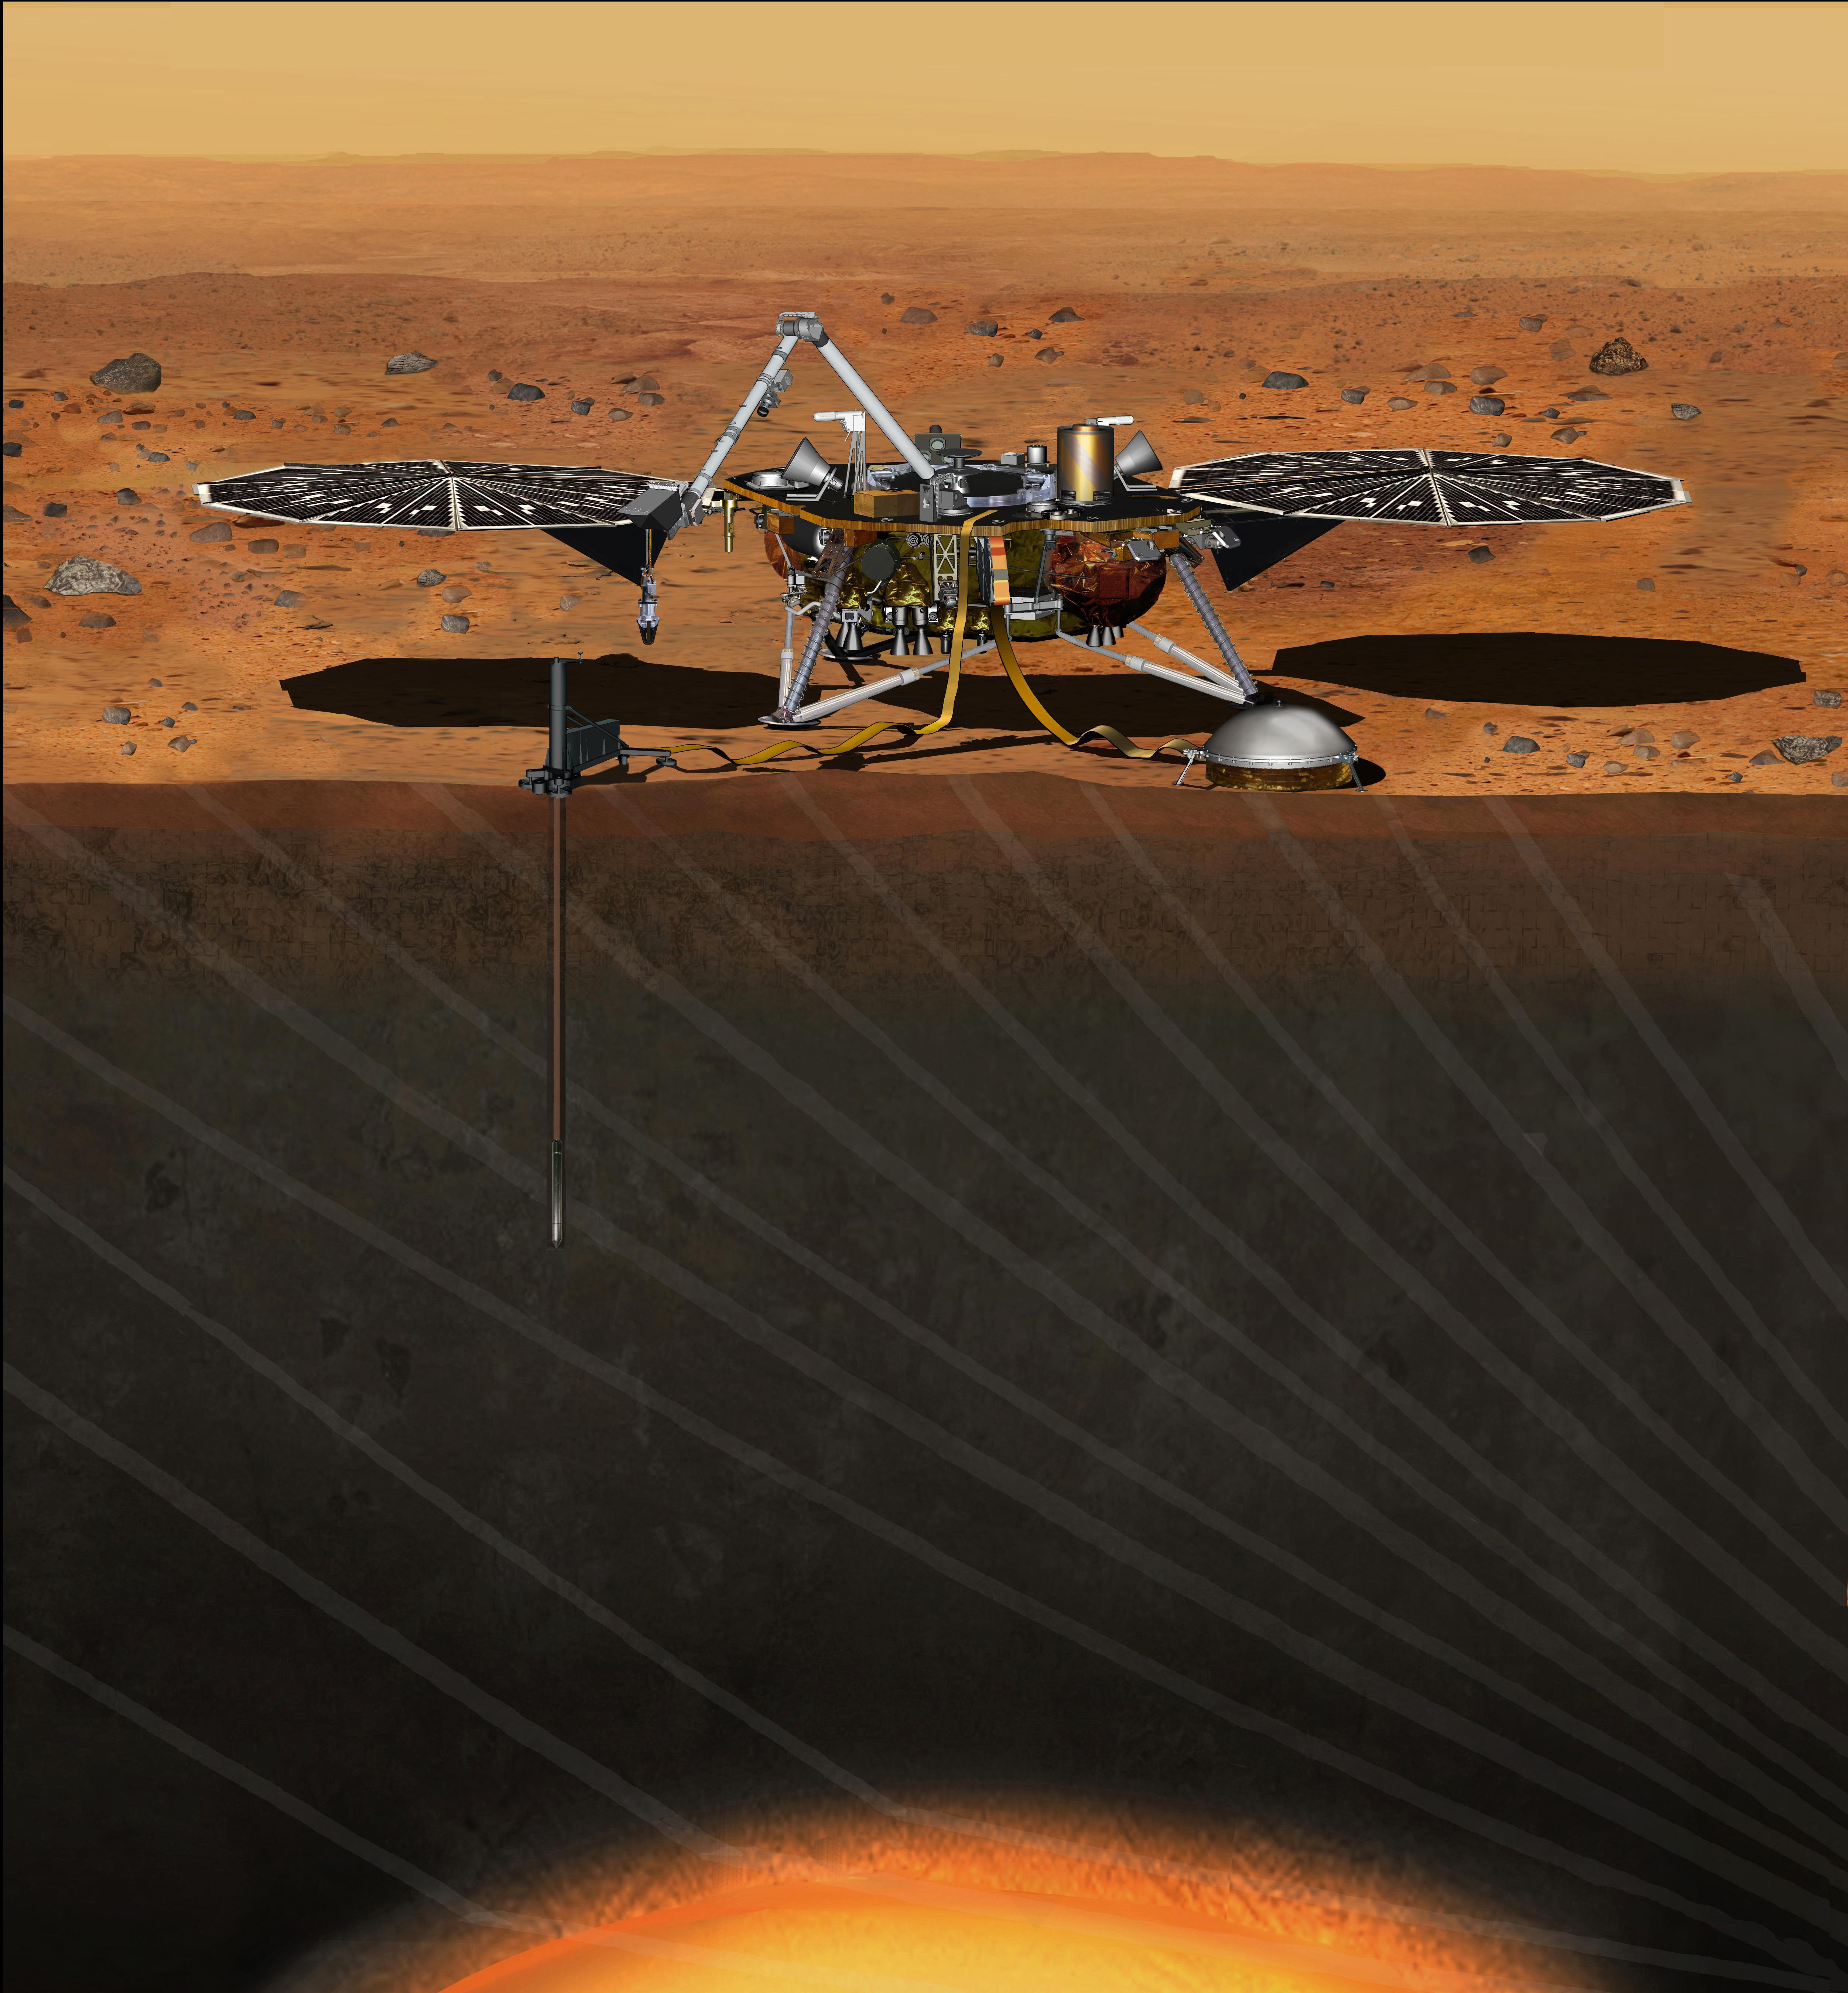 globe mars landings - photo #27